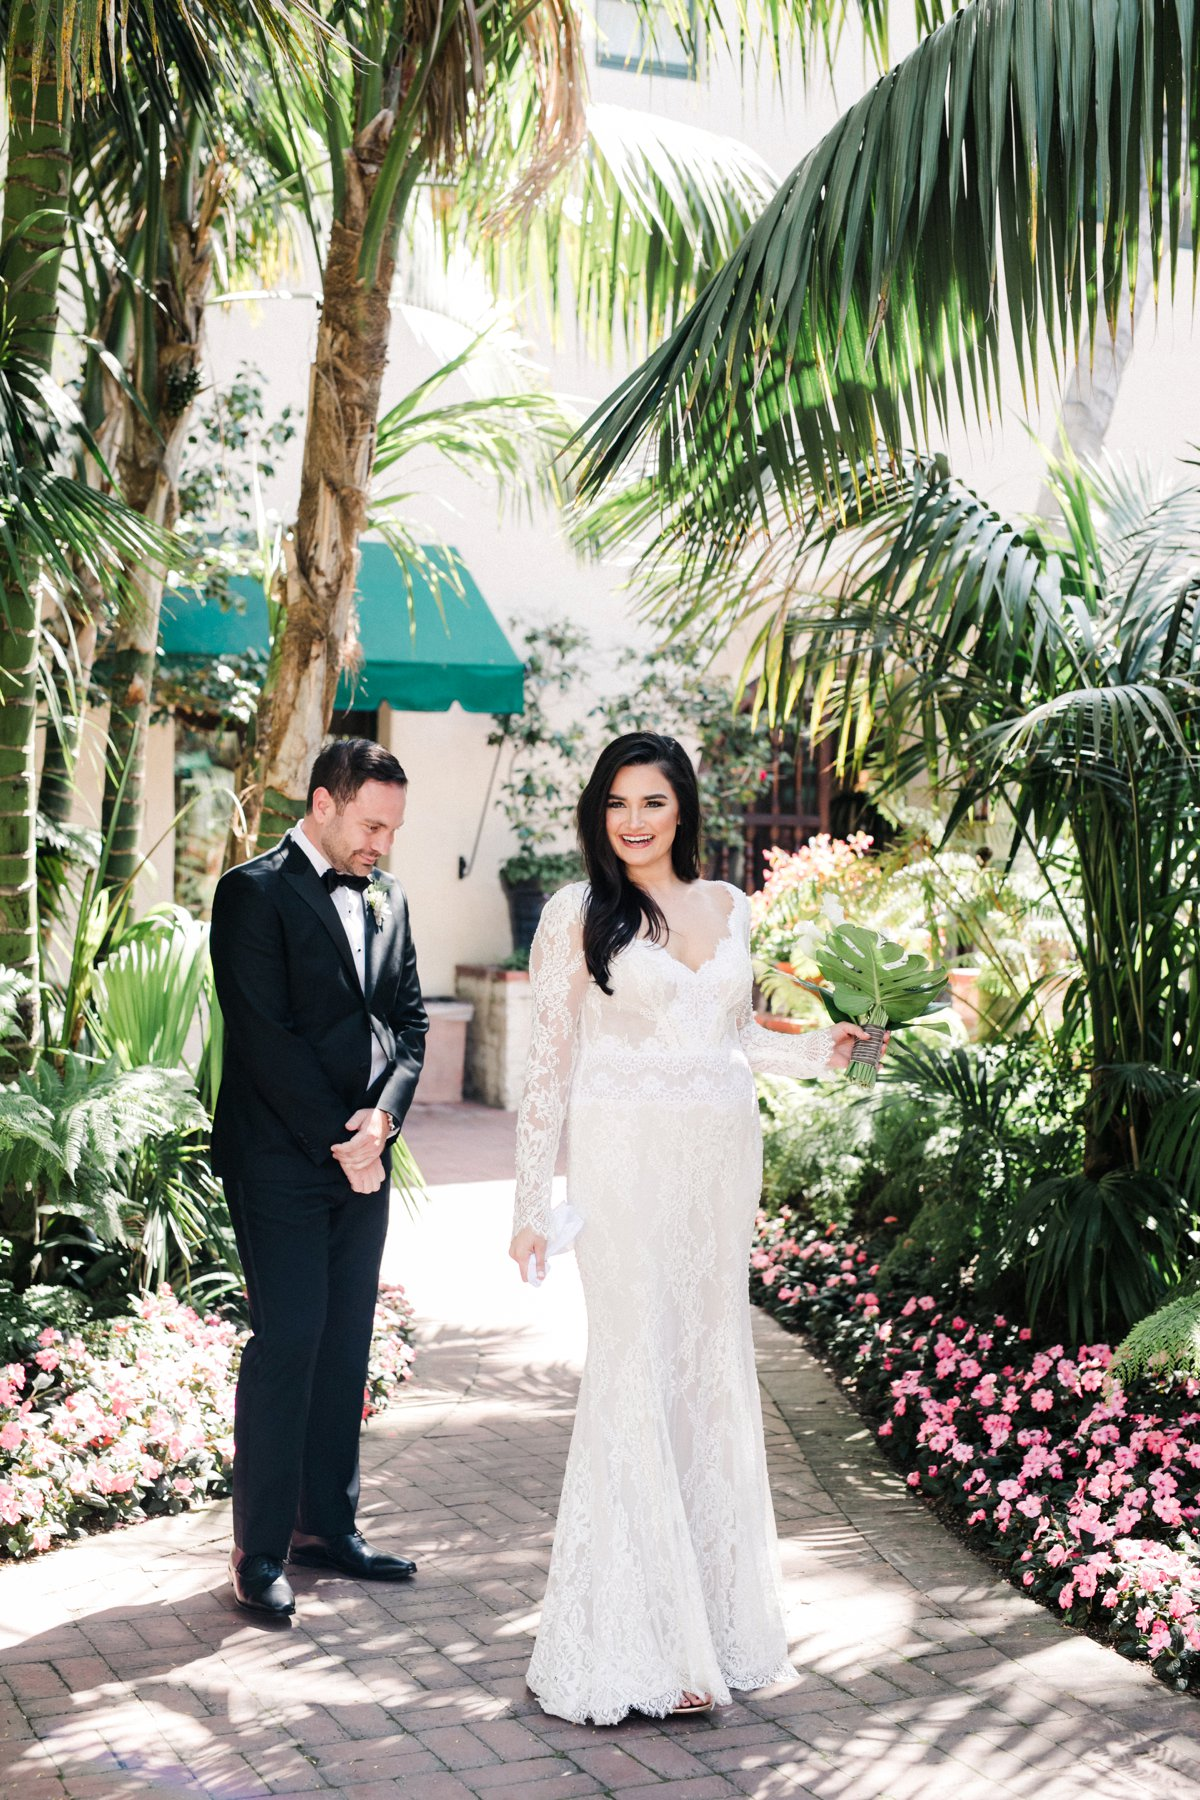 wedding first looks - photo by Anna Delores https://ruffledblog.com/chic-modern-wedding-at-four-seasons-santa-barbara